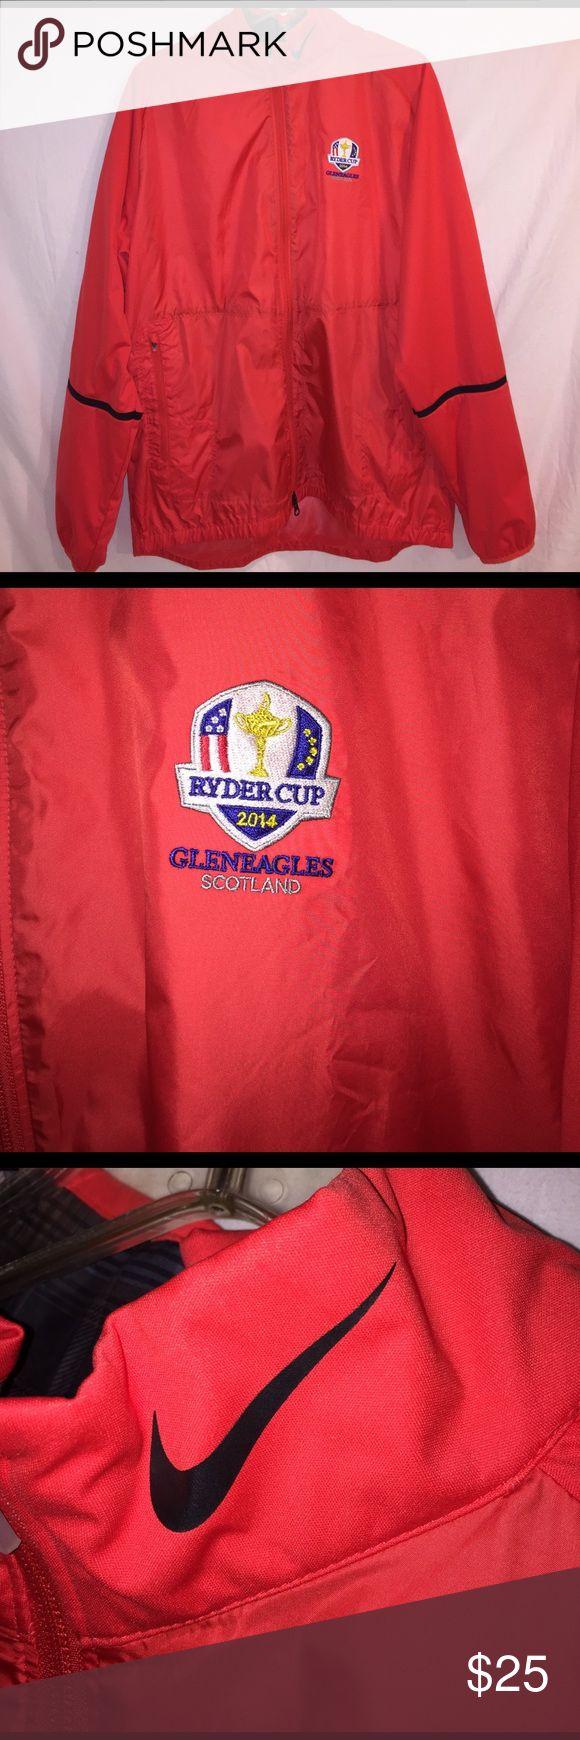 Nike Golf 2014 Ryder's cup jacket Great lightweight Nike golf jacket. 2014 Ryder cup edition size Large Nike Jackets & Coats Lightweight & Shirt Jackets